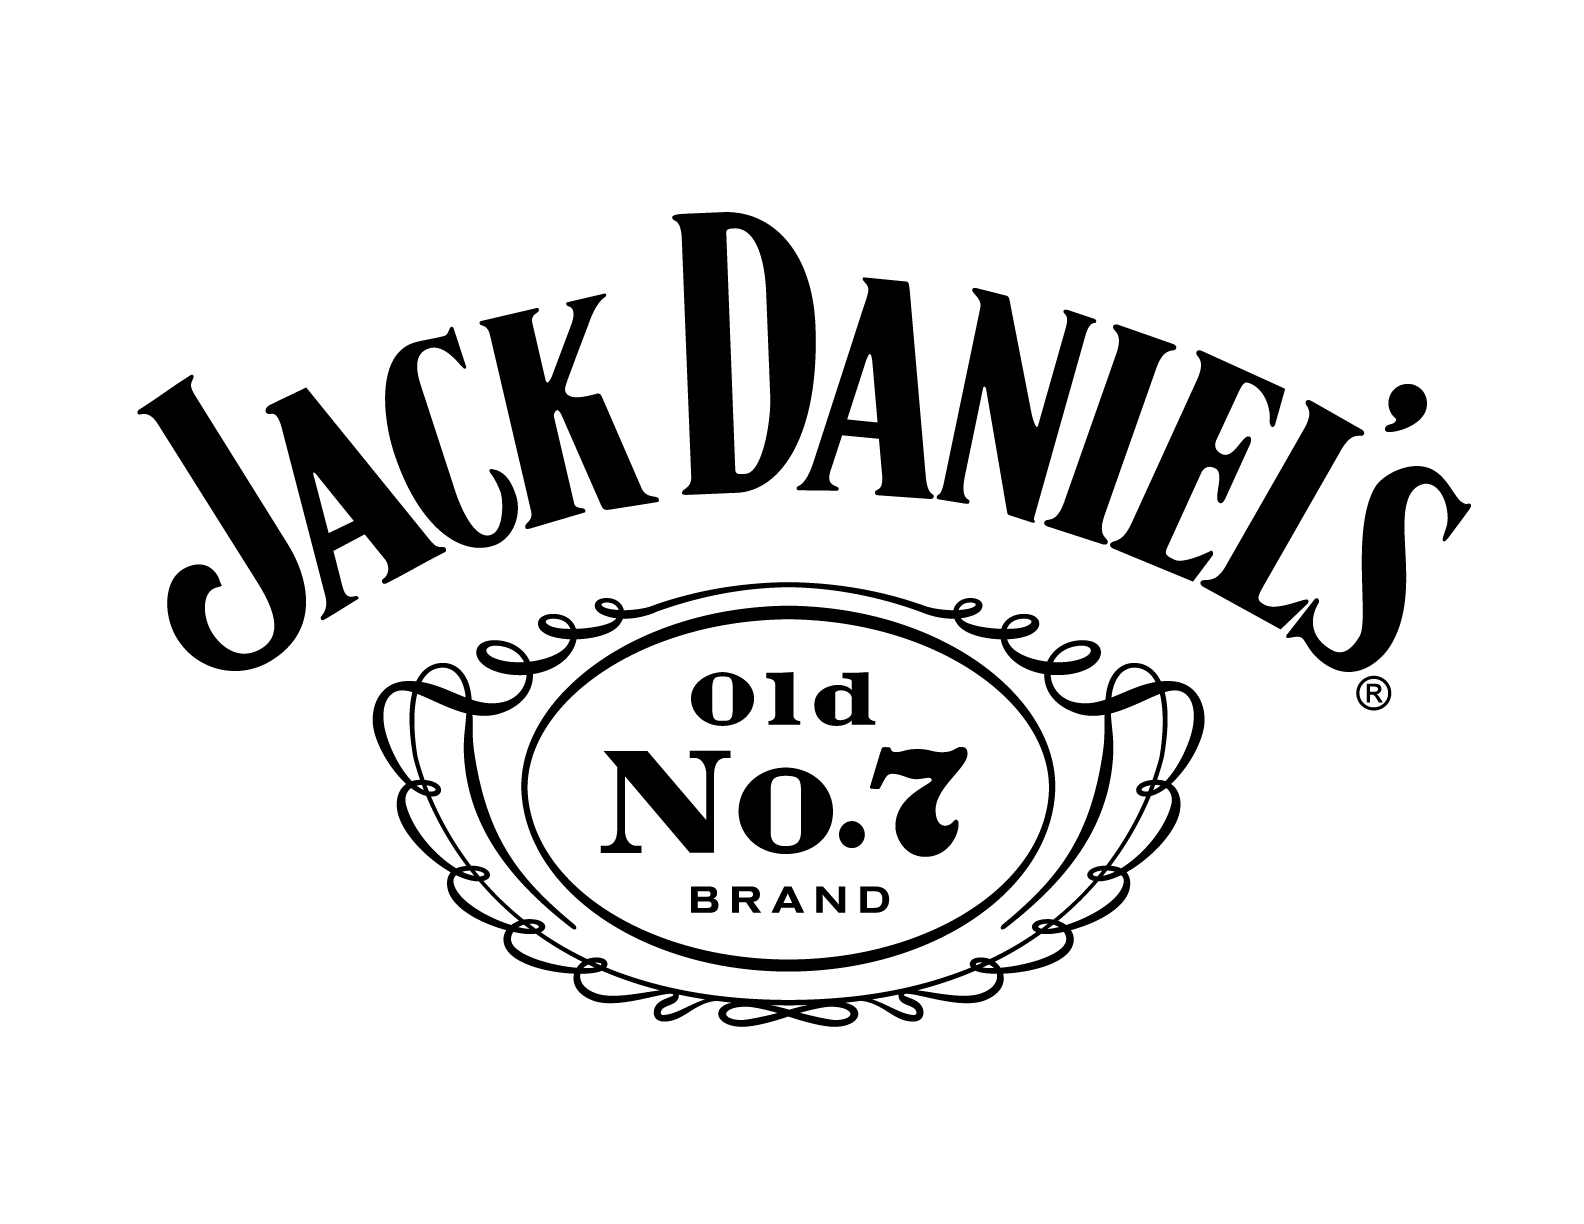 174487 Jdono7 Transparent